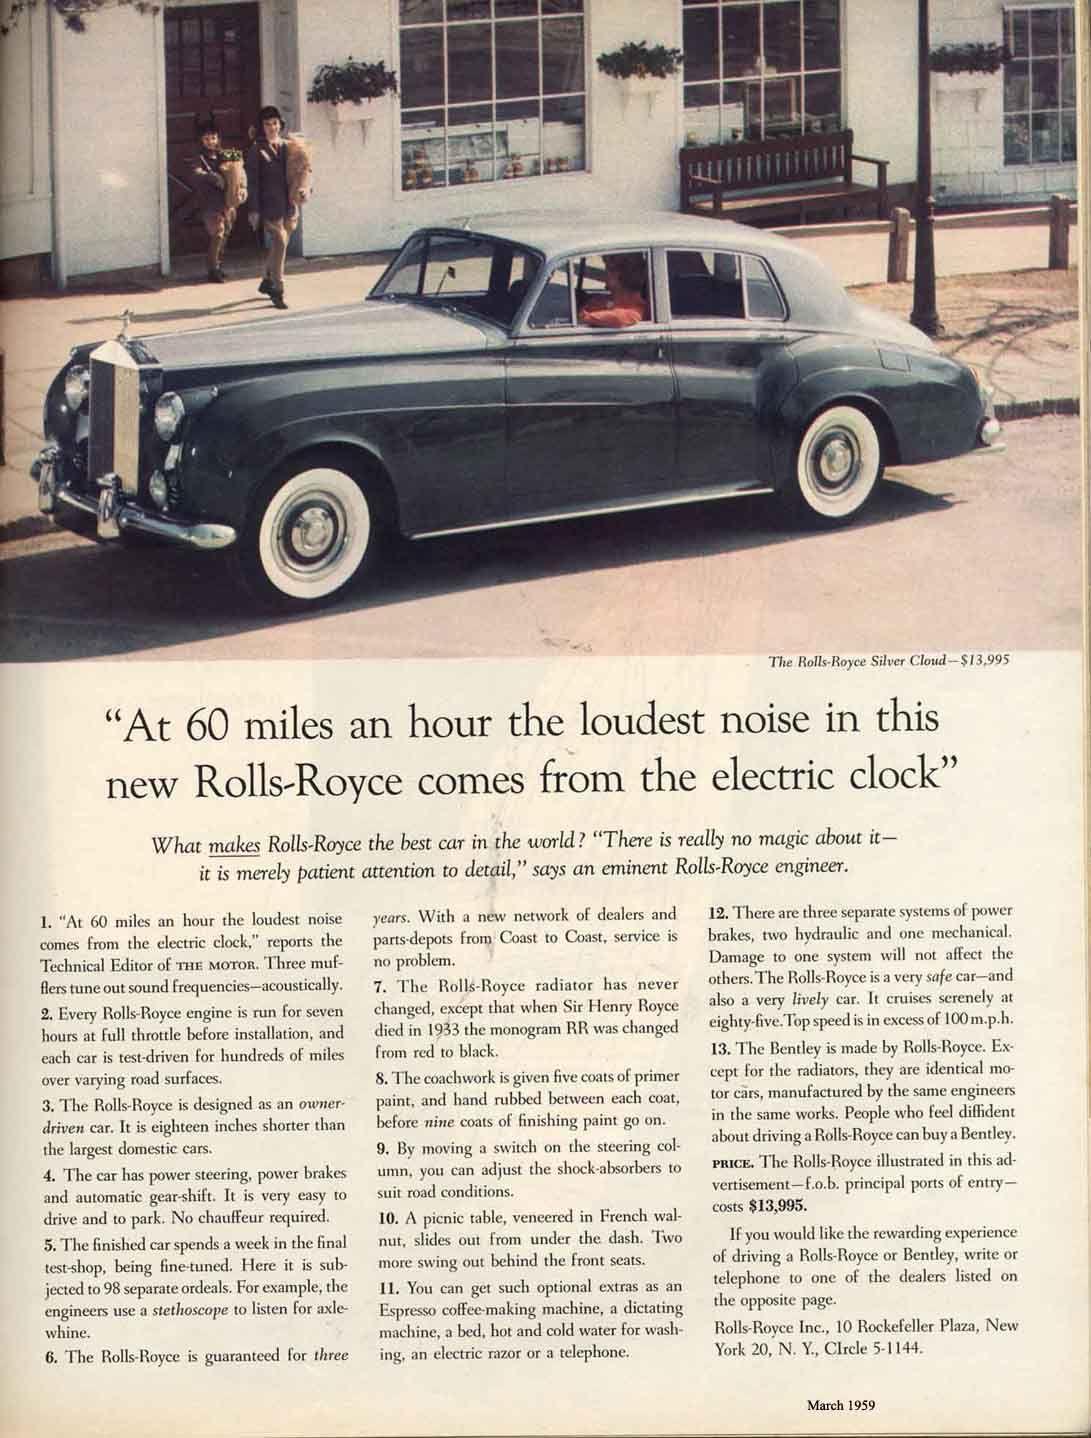 David Ogilvy's famous Rolls Royce ad